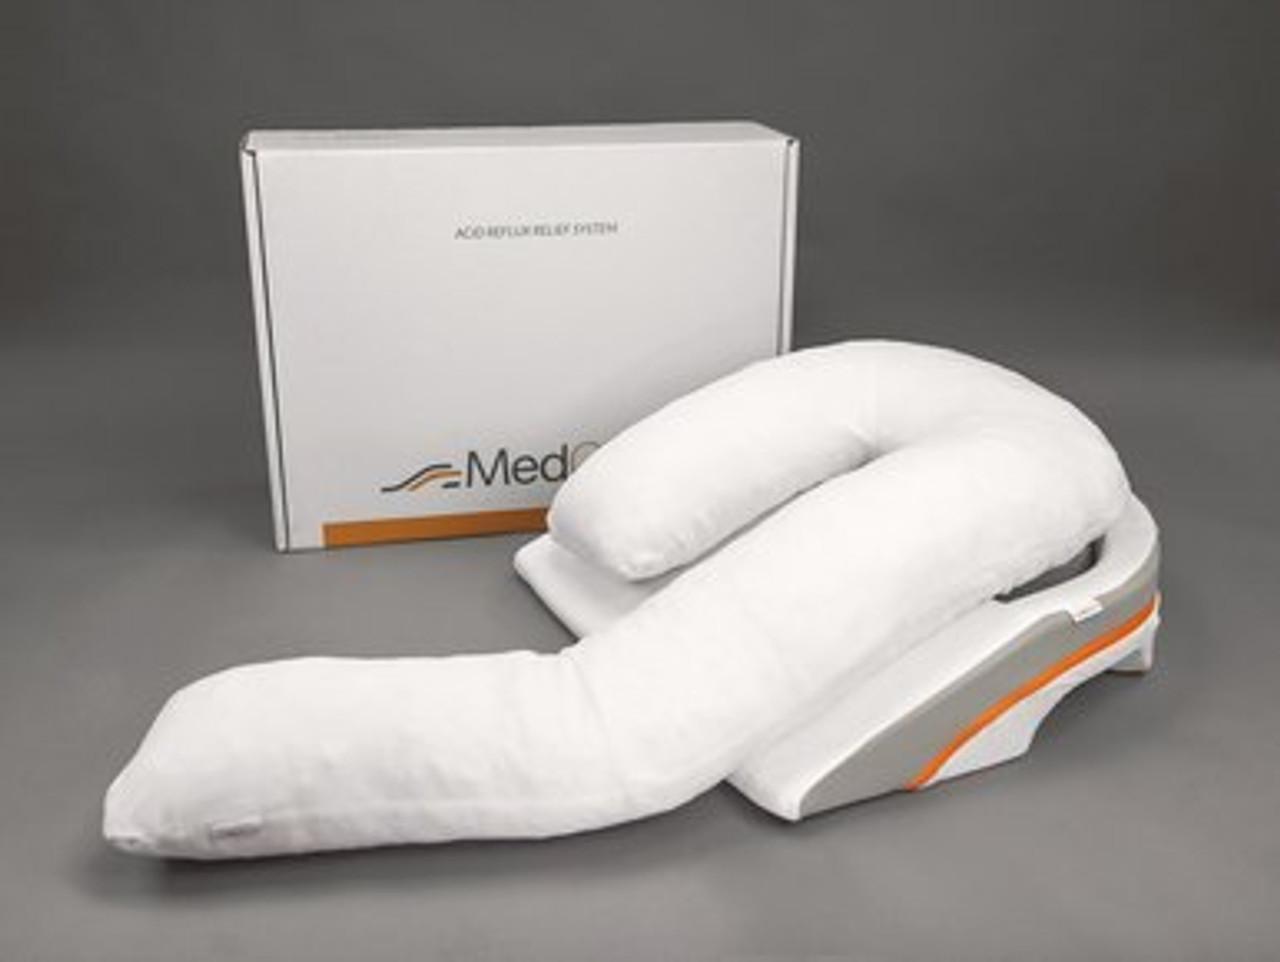 reflux relief pillow